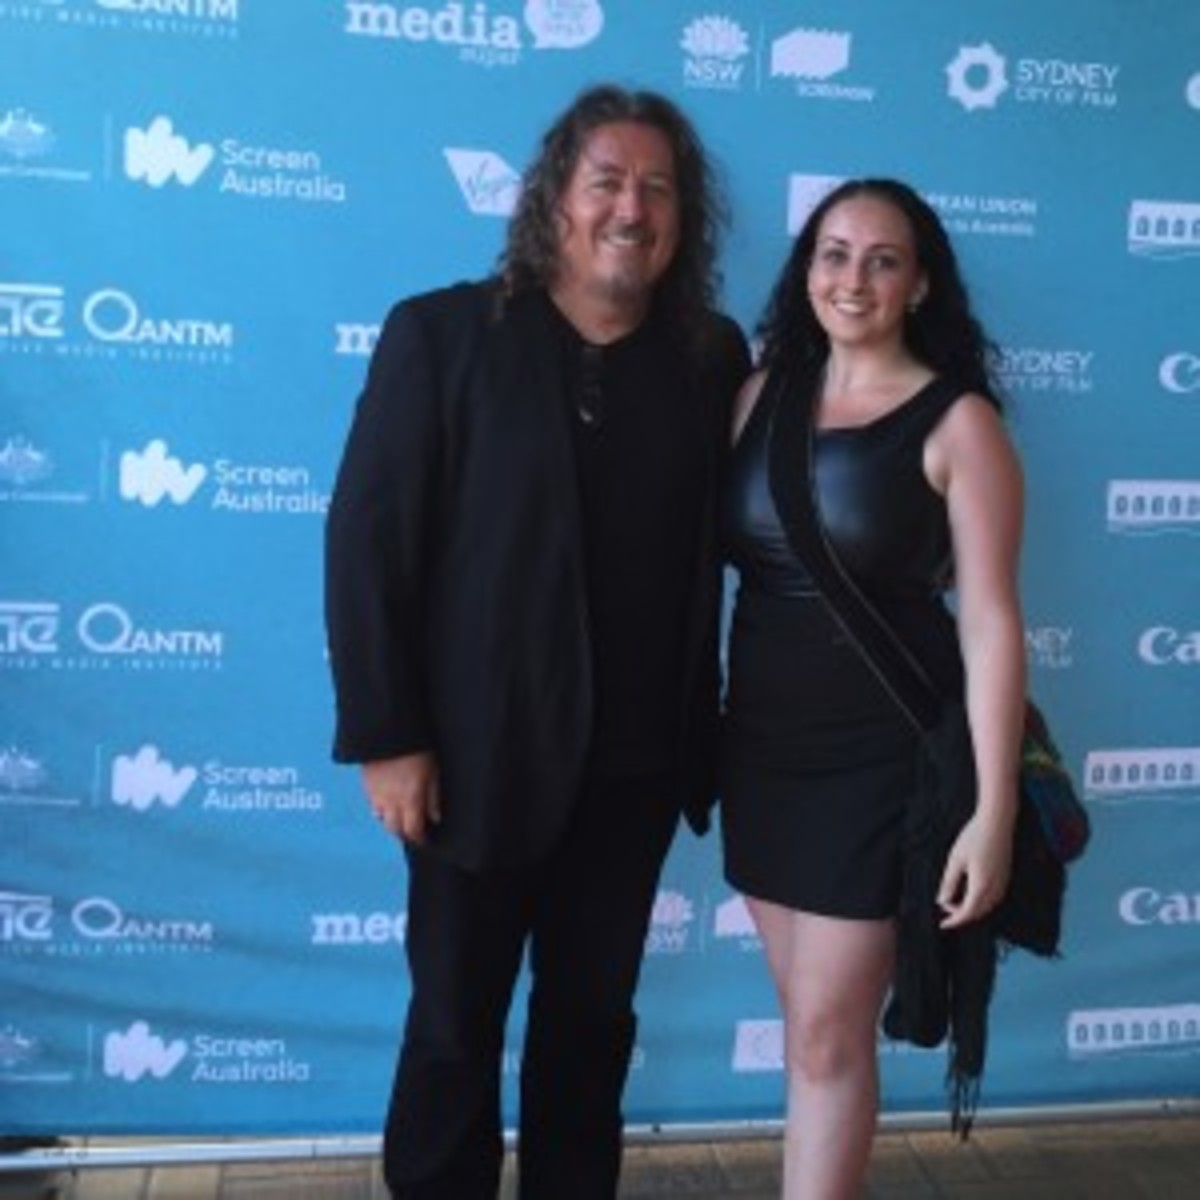 Kouguell Interviews Tribeca Film Festival 'Whoopi's Shorts' Filmmaker Joe D'Arcy | Script Magazine #scriptchat #screenwriting